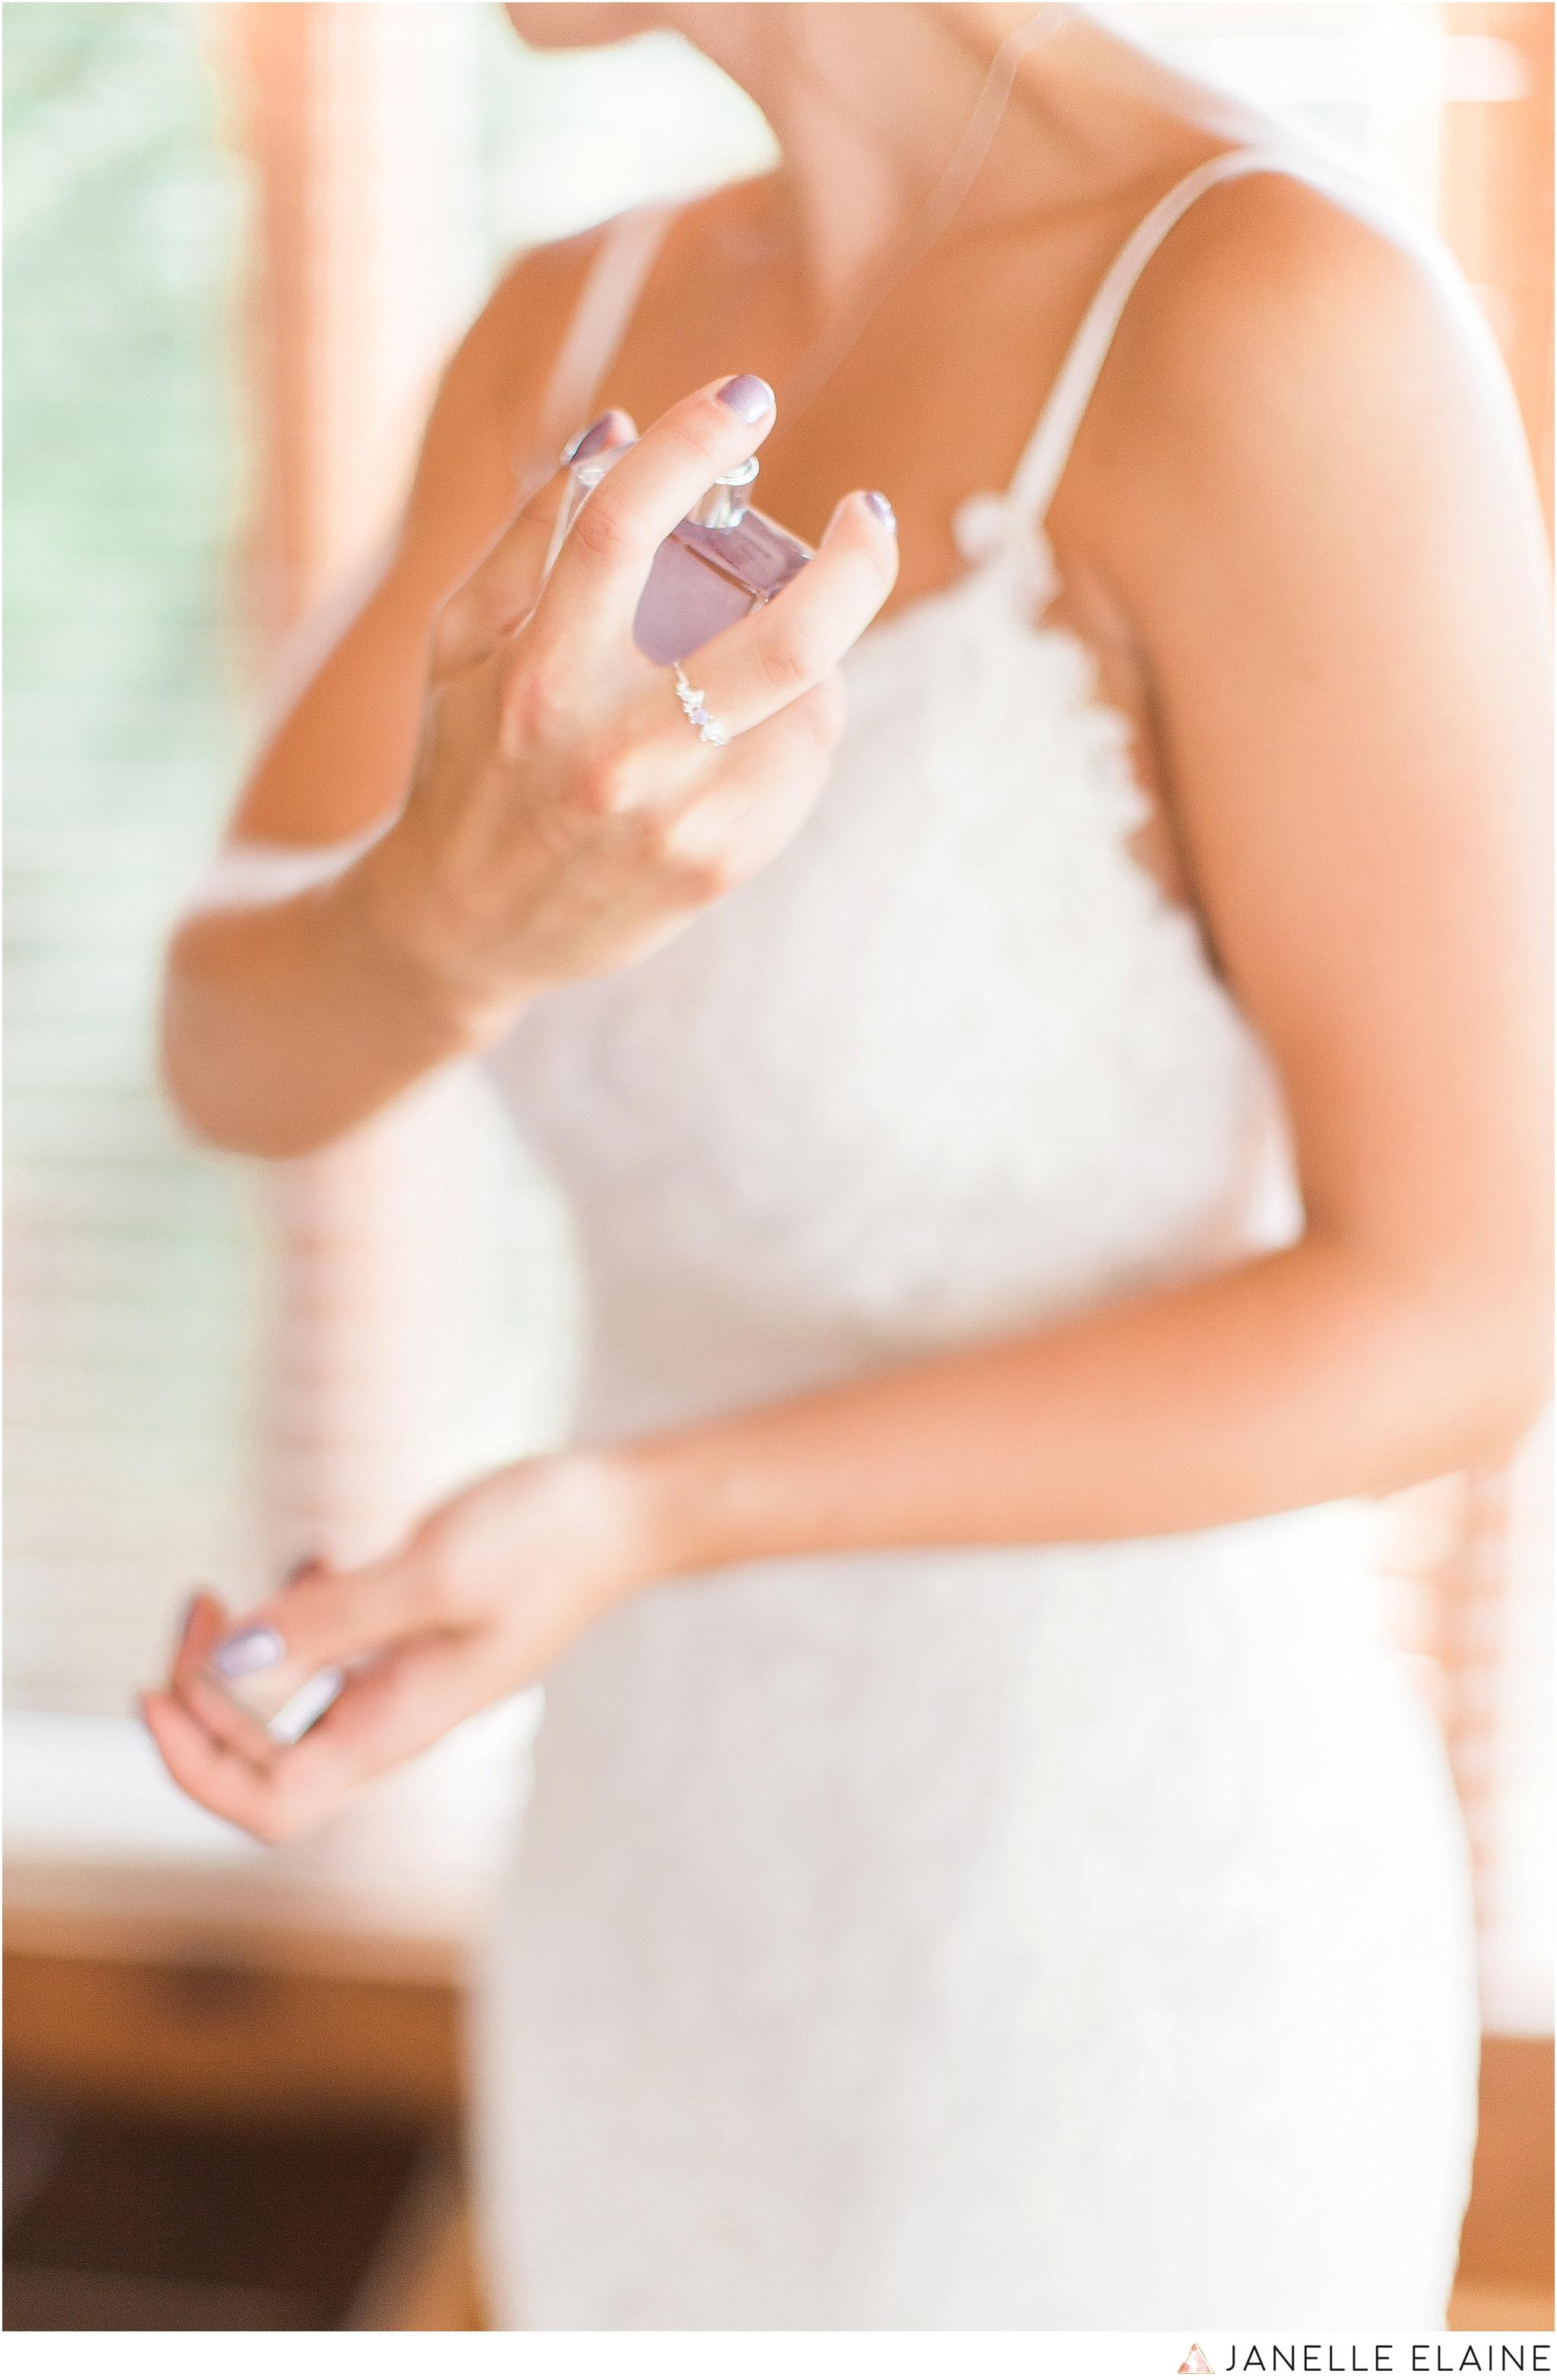 warnsholz-wedding-michigan-photography-janelle elaine photography-33.jpg